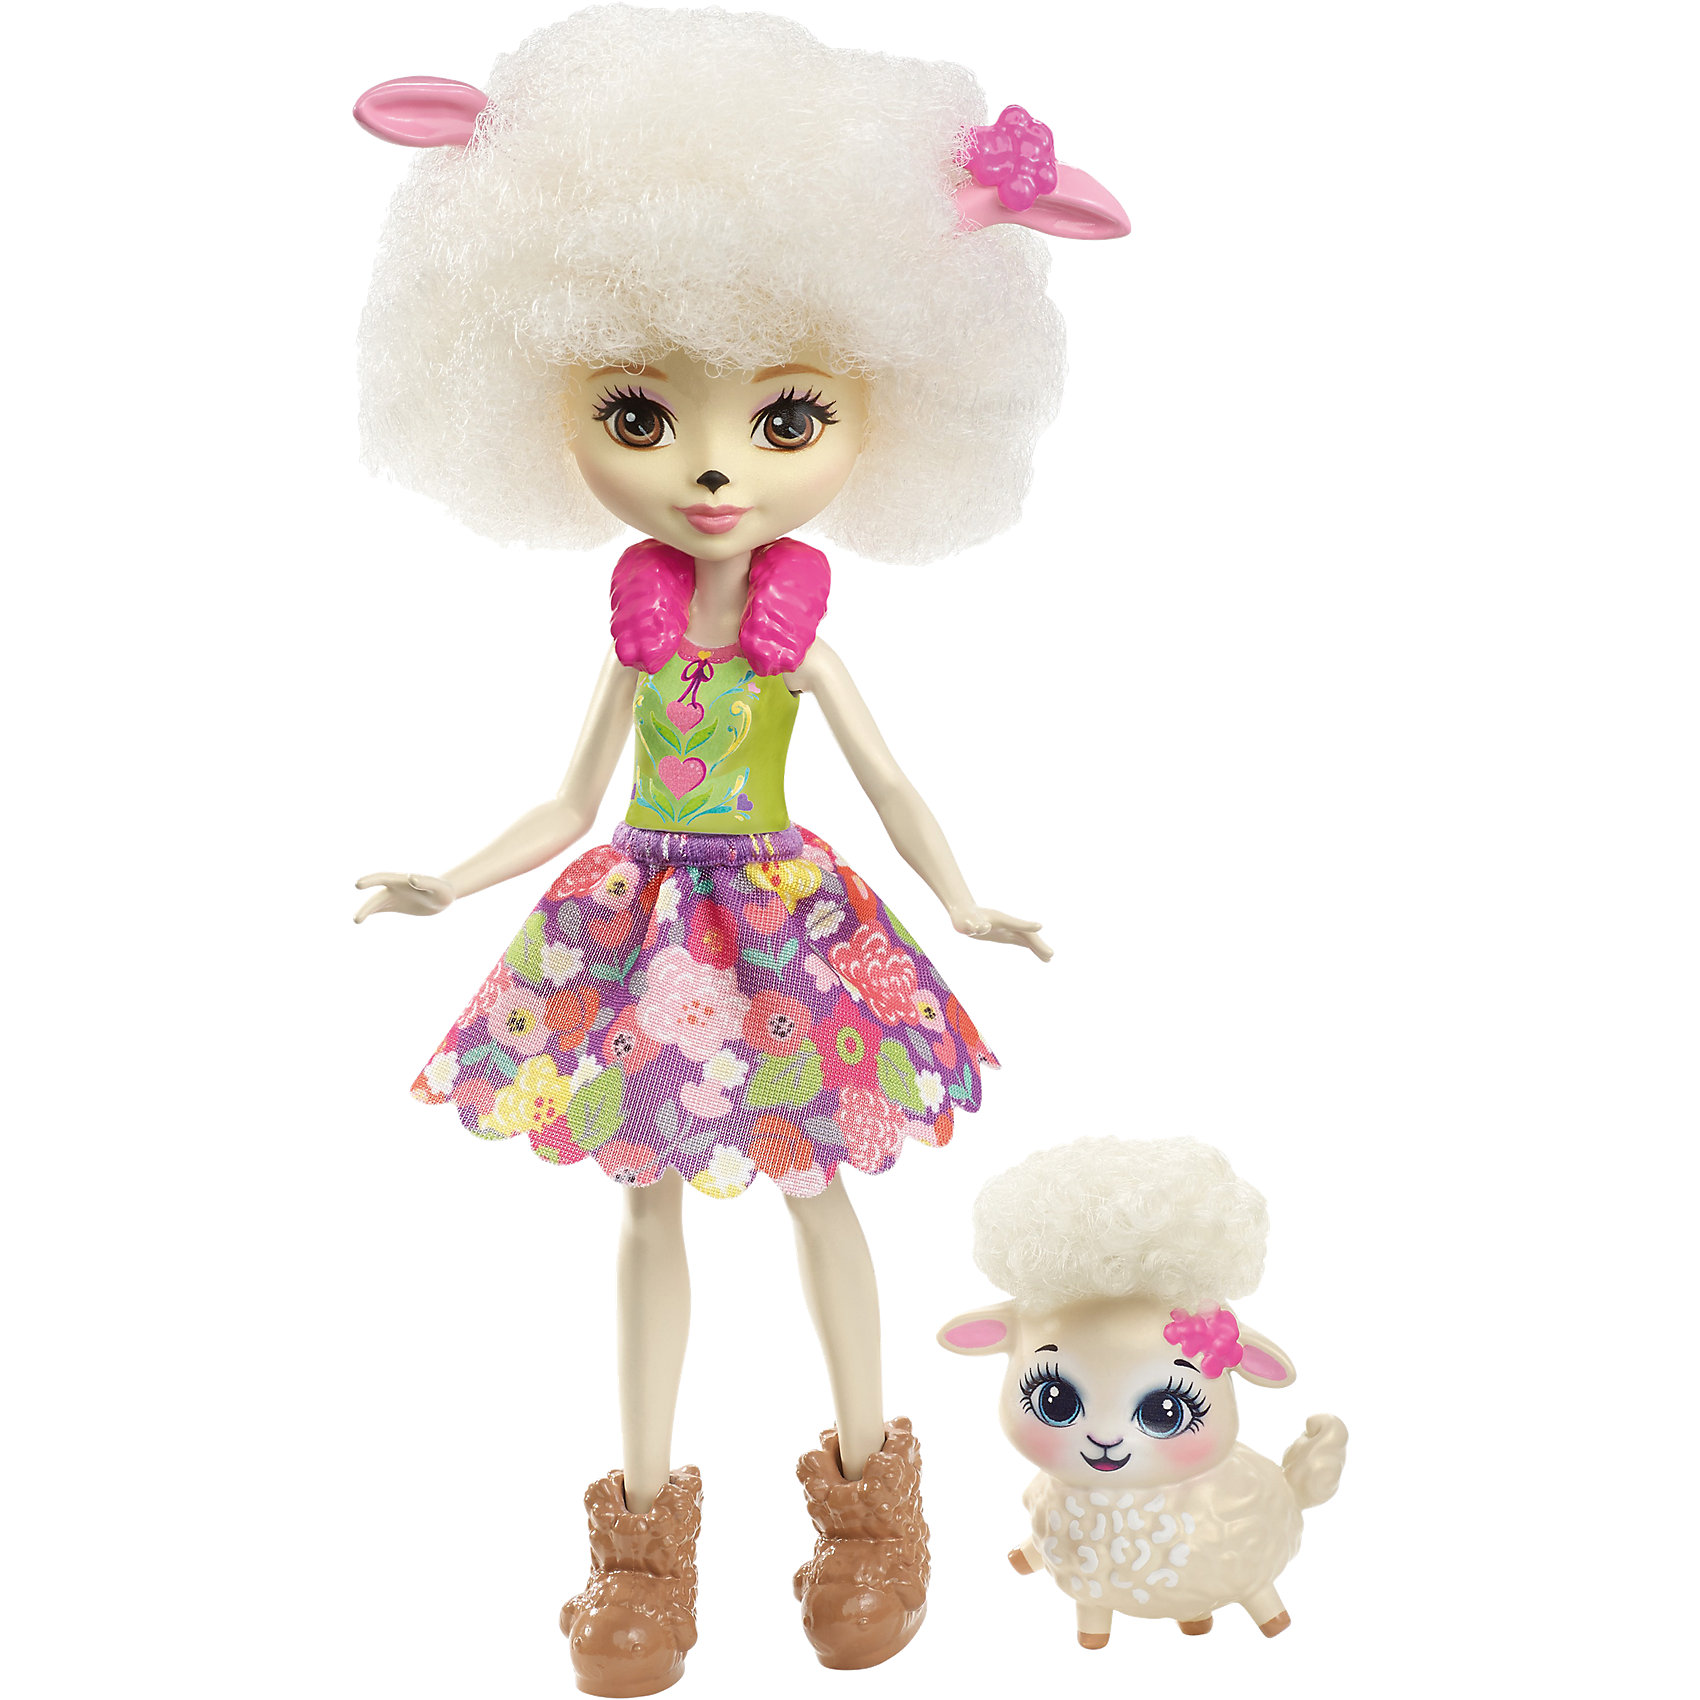 Кукла-овечка Enchantimals Лорна ЛэмбМини-куклы<br><br><br>Ширина мм: 125<br>Глубина мм: 55<br>Высота мм: 215<br>Вес г: 150<br>Возраст от месяцев: 72<br>Возраст до месяцев: 120<br>Пол: Женский<br>Возраст: Детский<br>SKU: 6739702